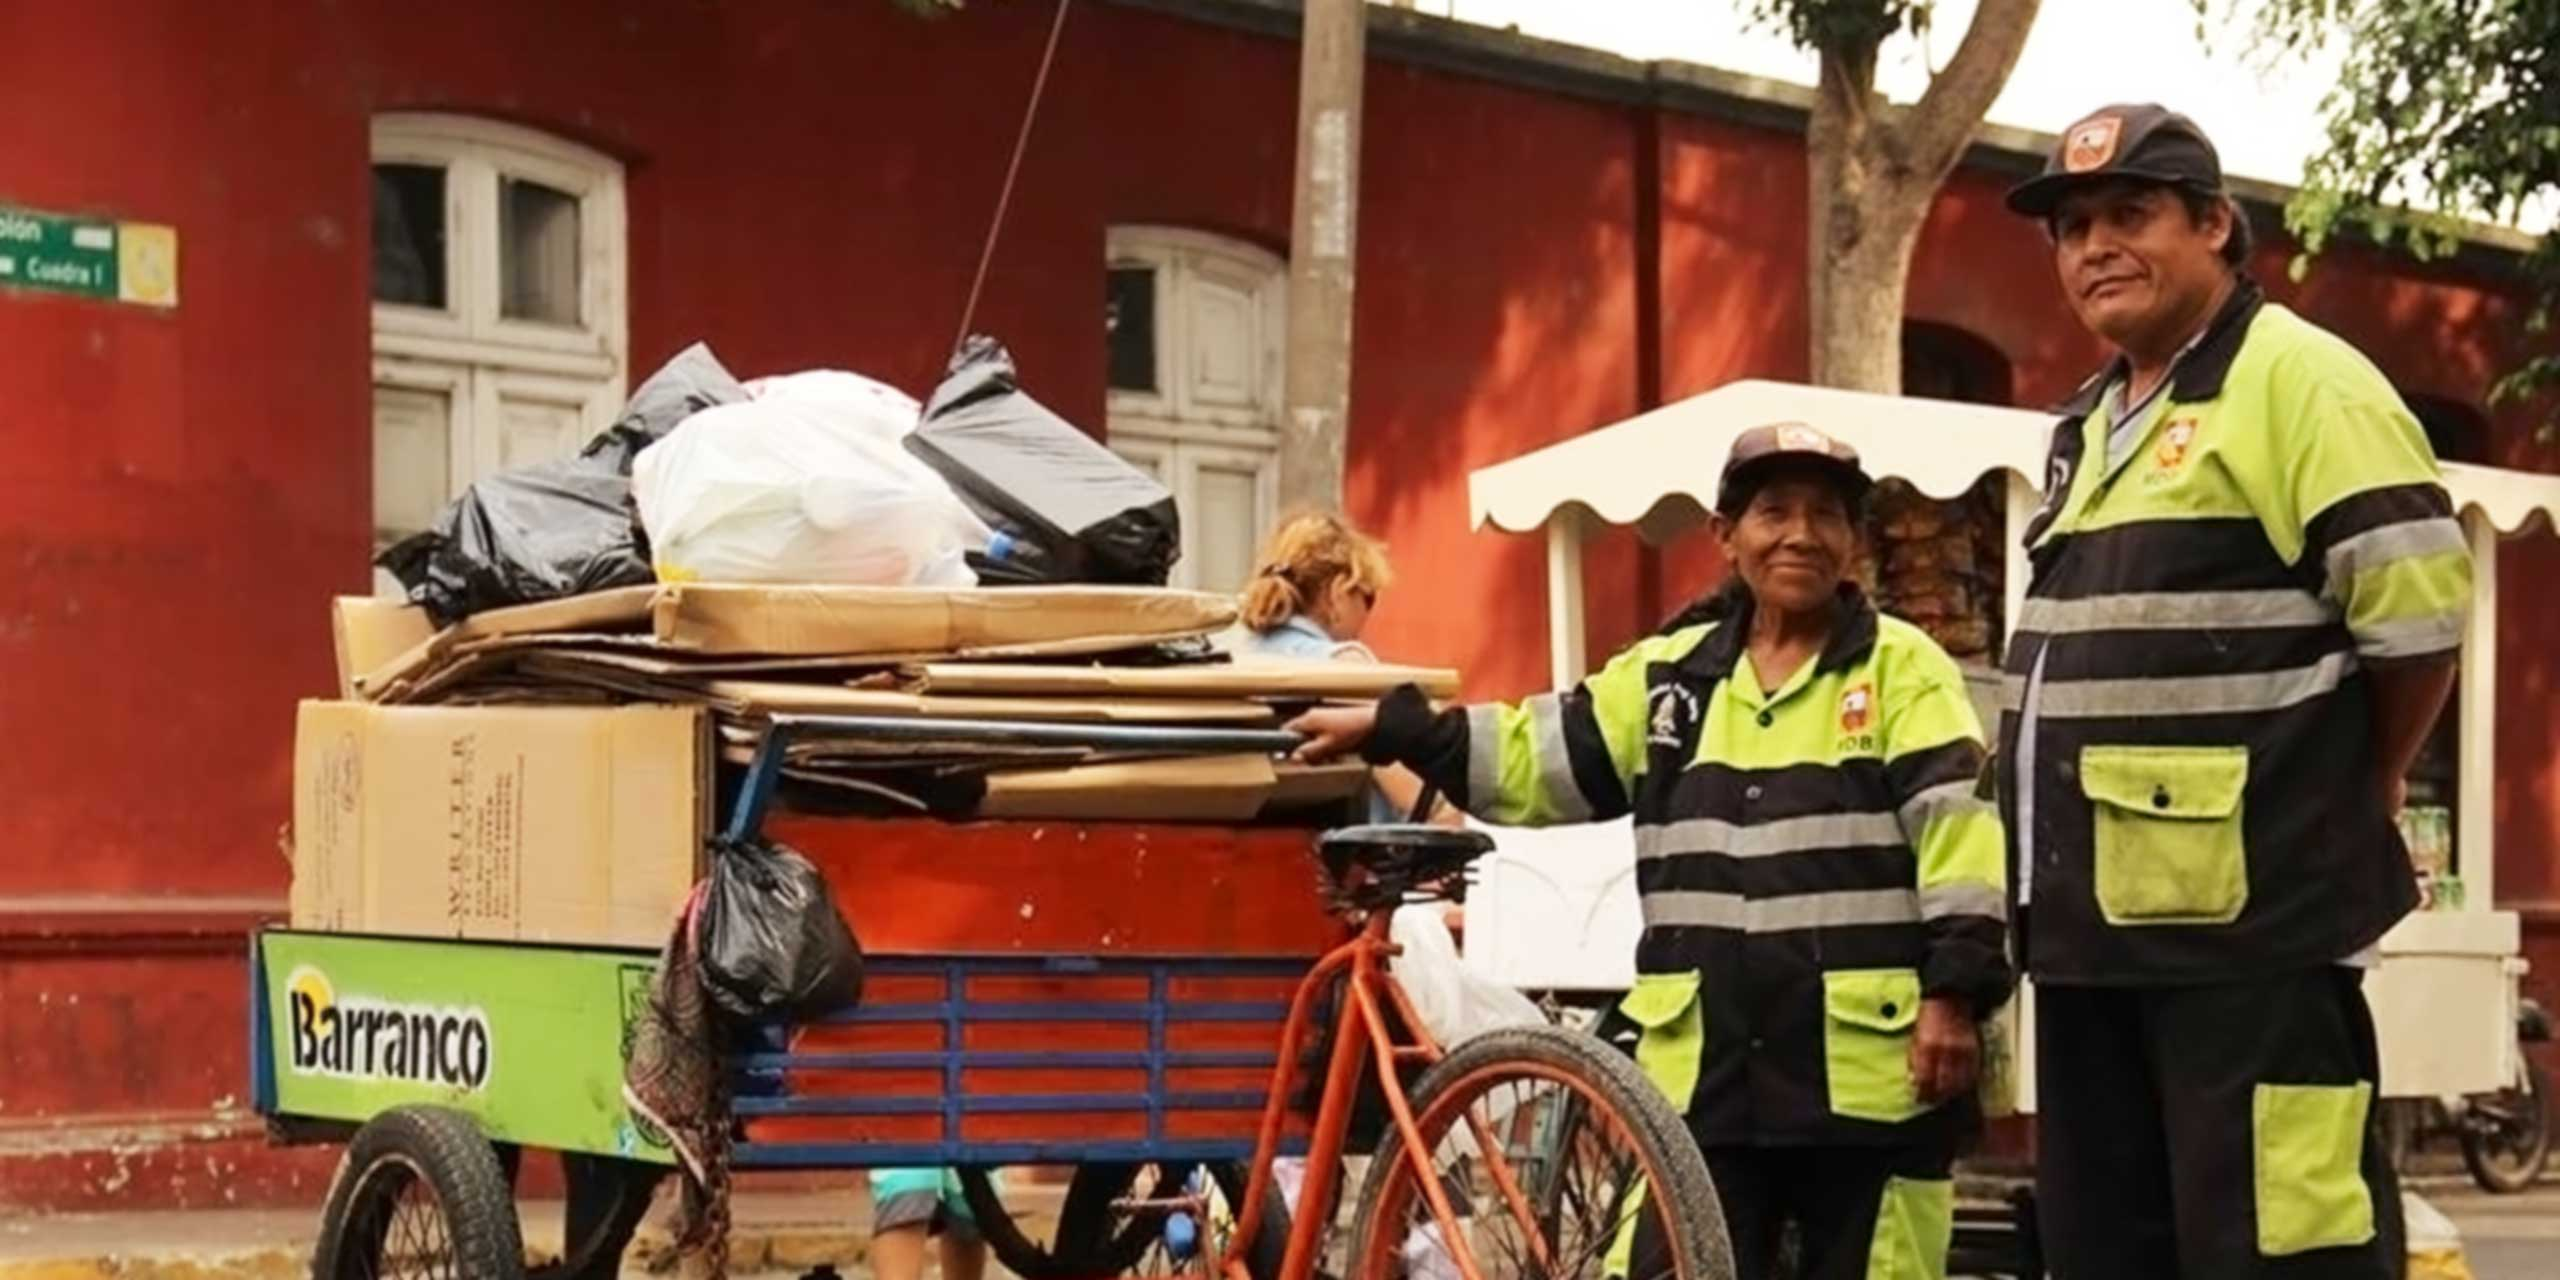 http://staging.skoll.org/wp-content/uploads/2014/03/ciudad-saludable-sl2.jpg